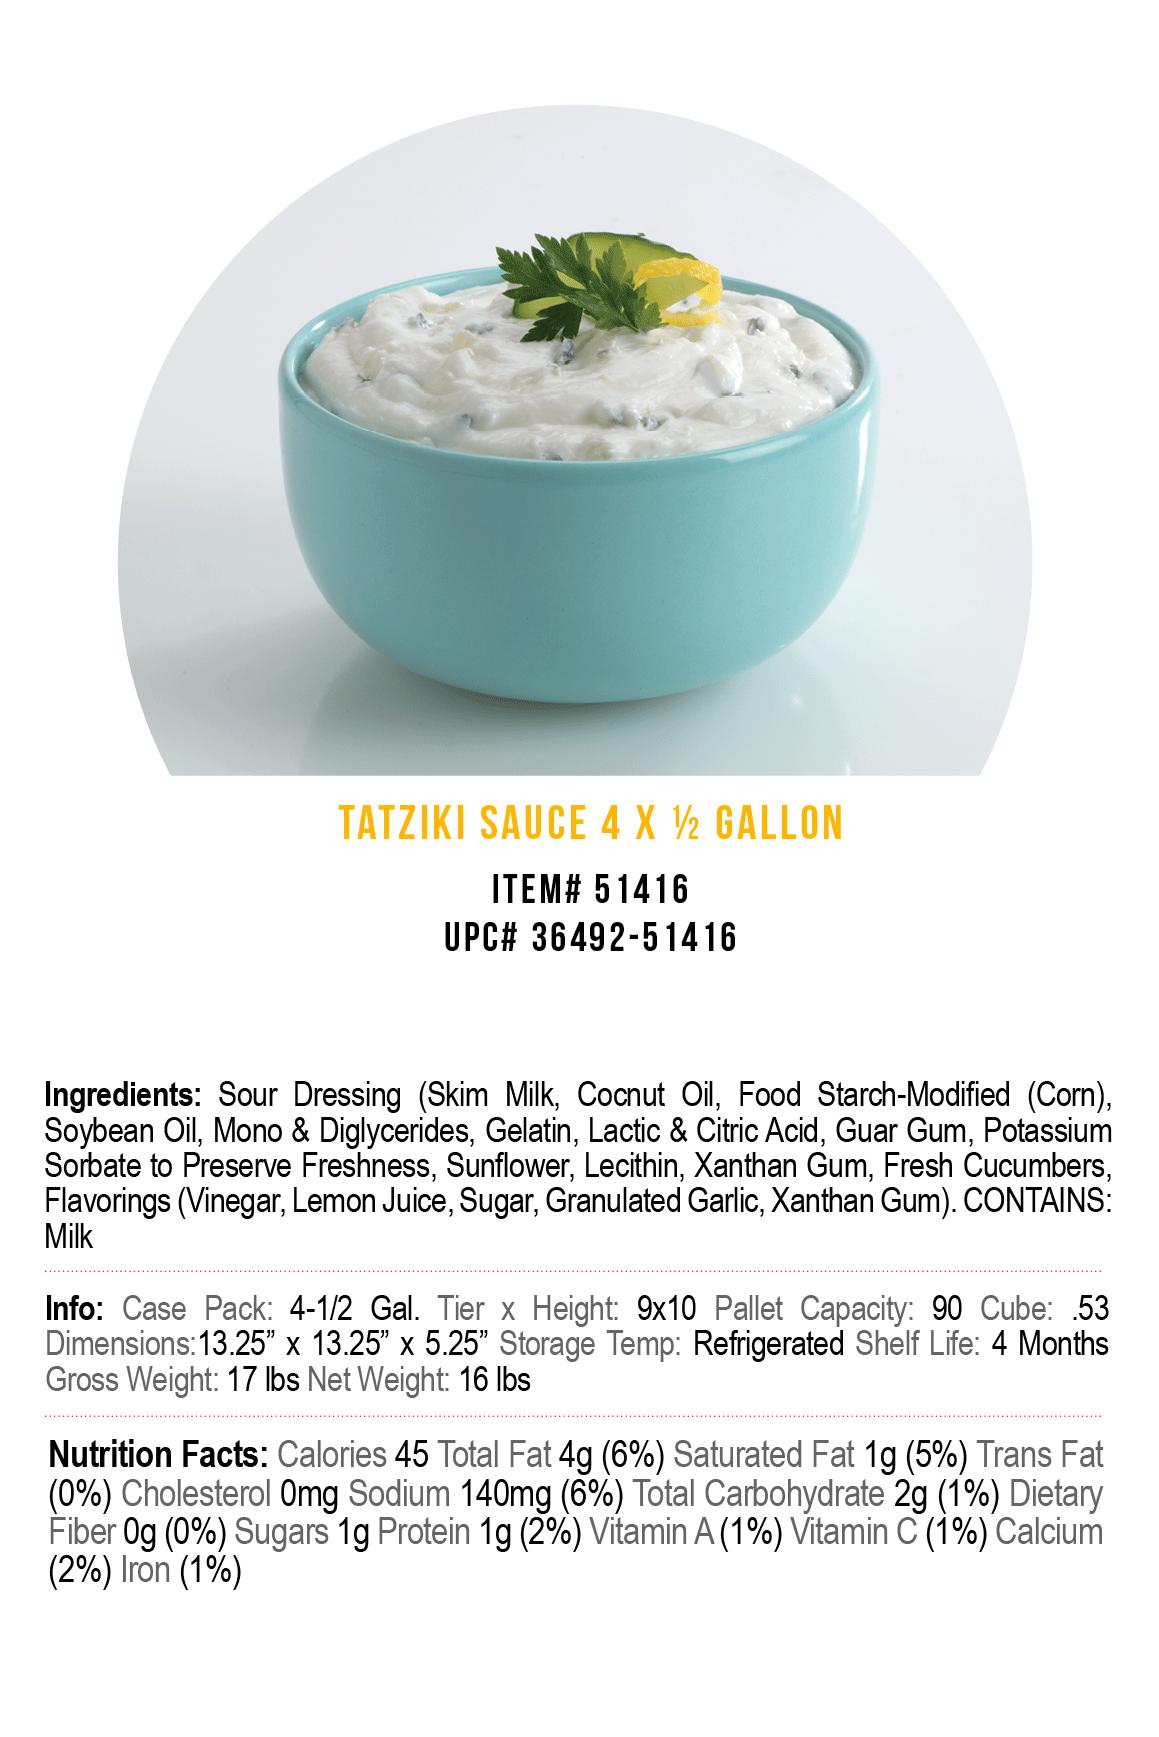 corfu-tatziki-half-gallon.png